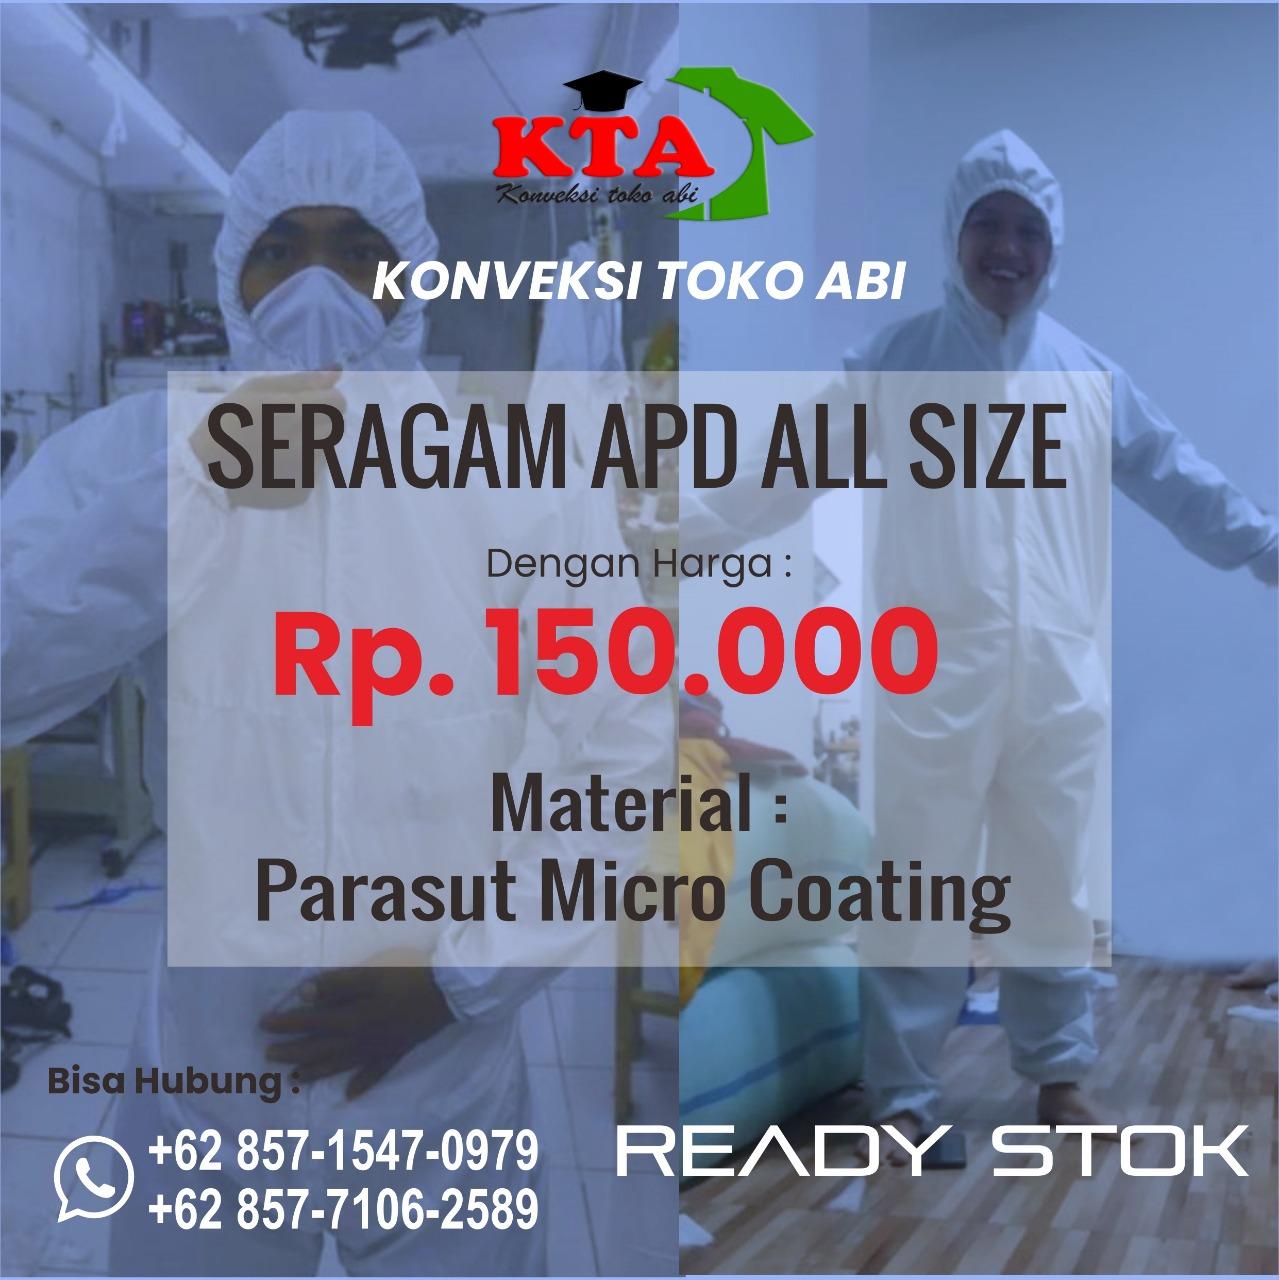 Parasut Micro Coating